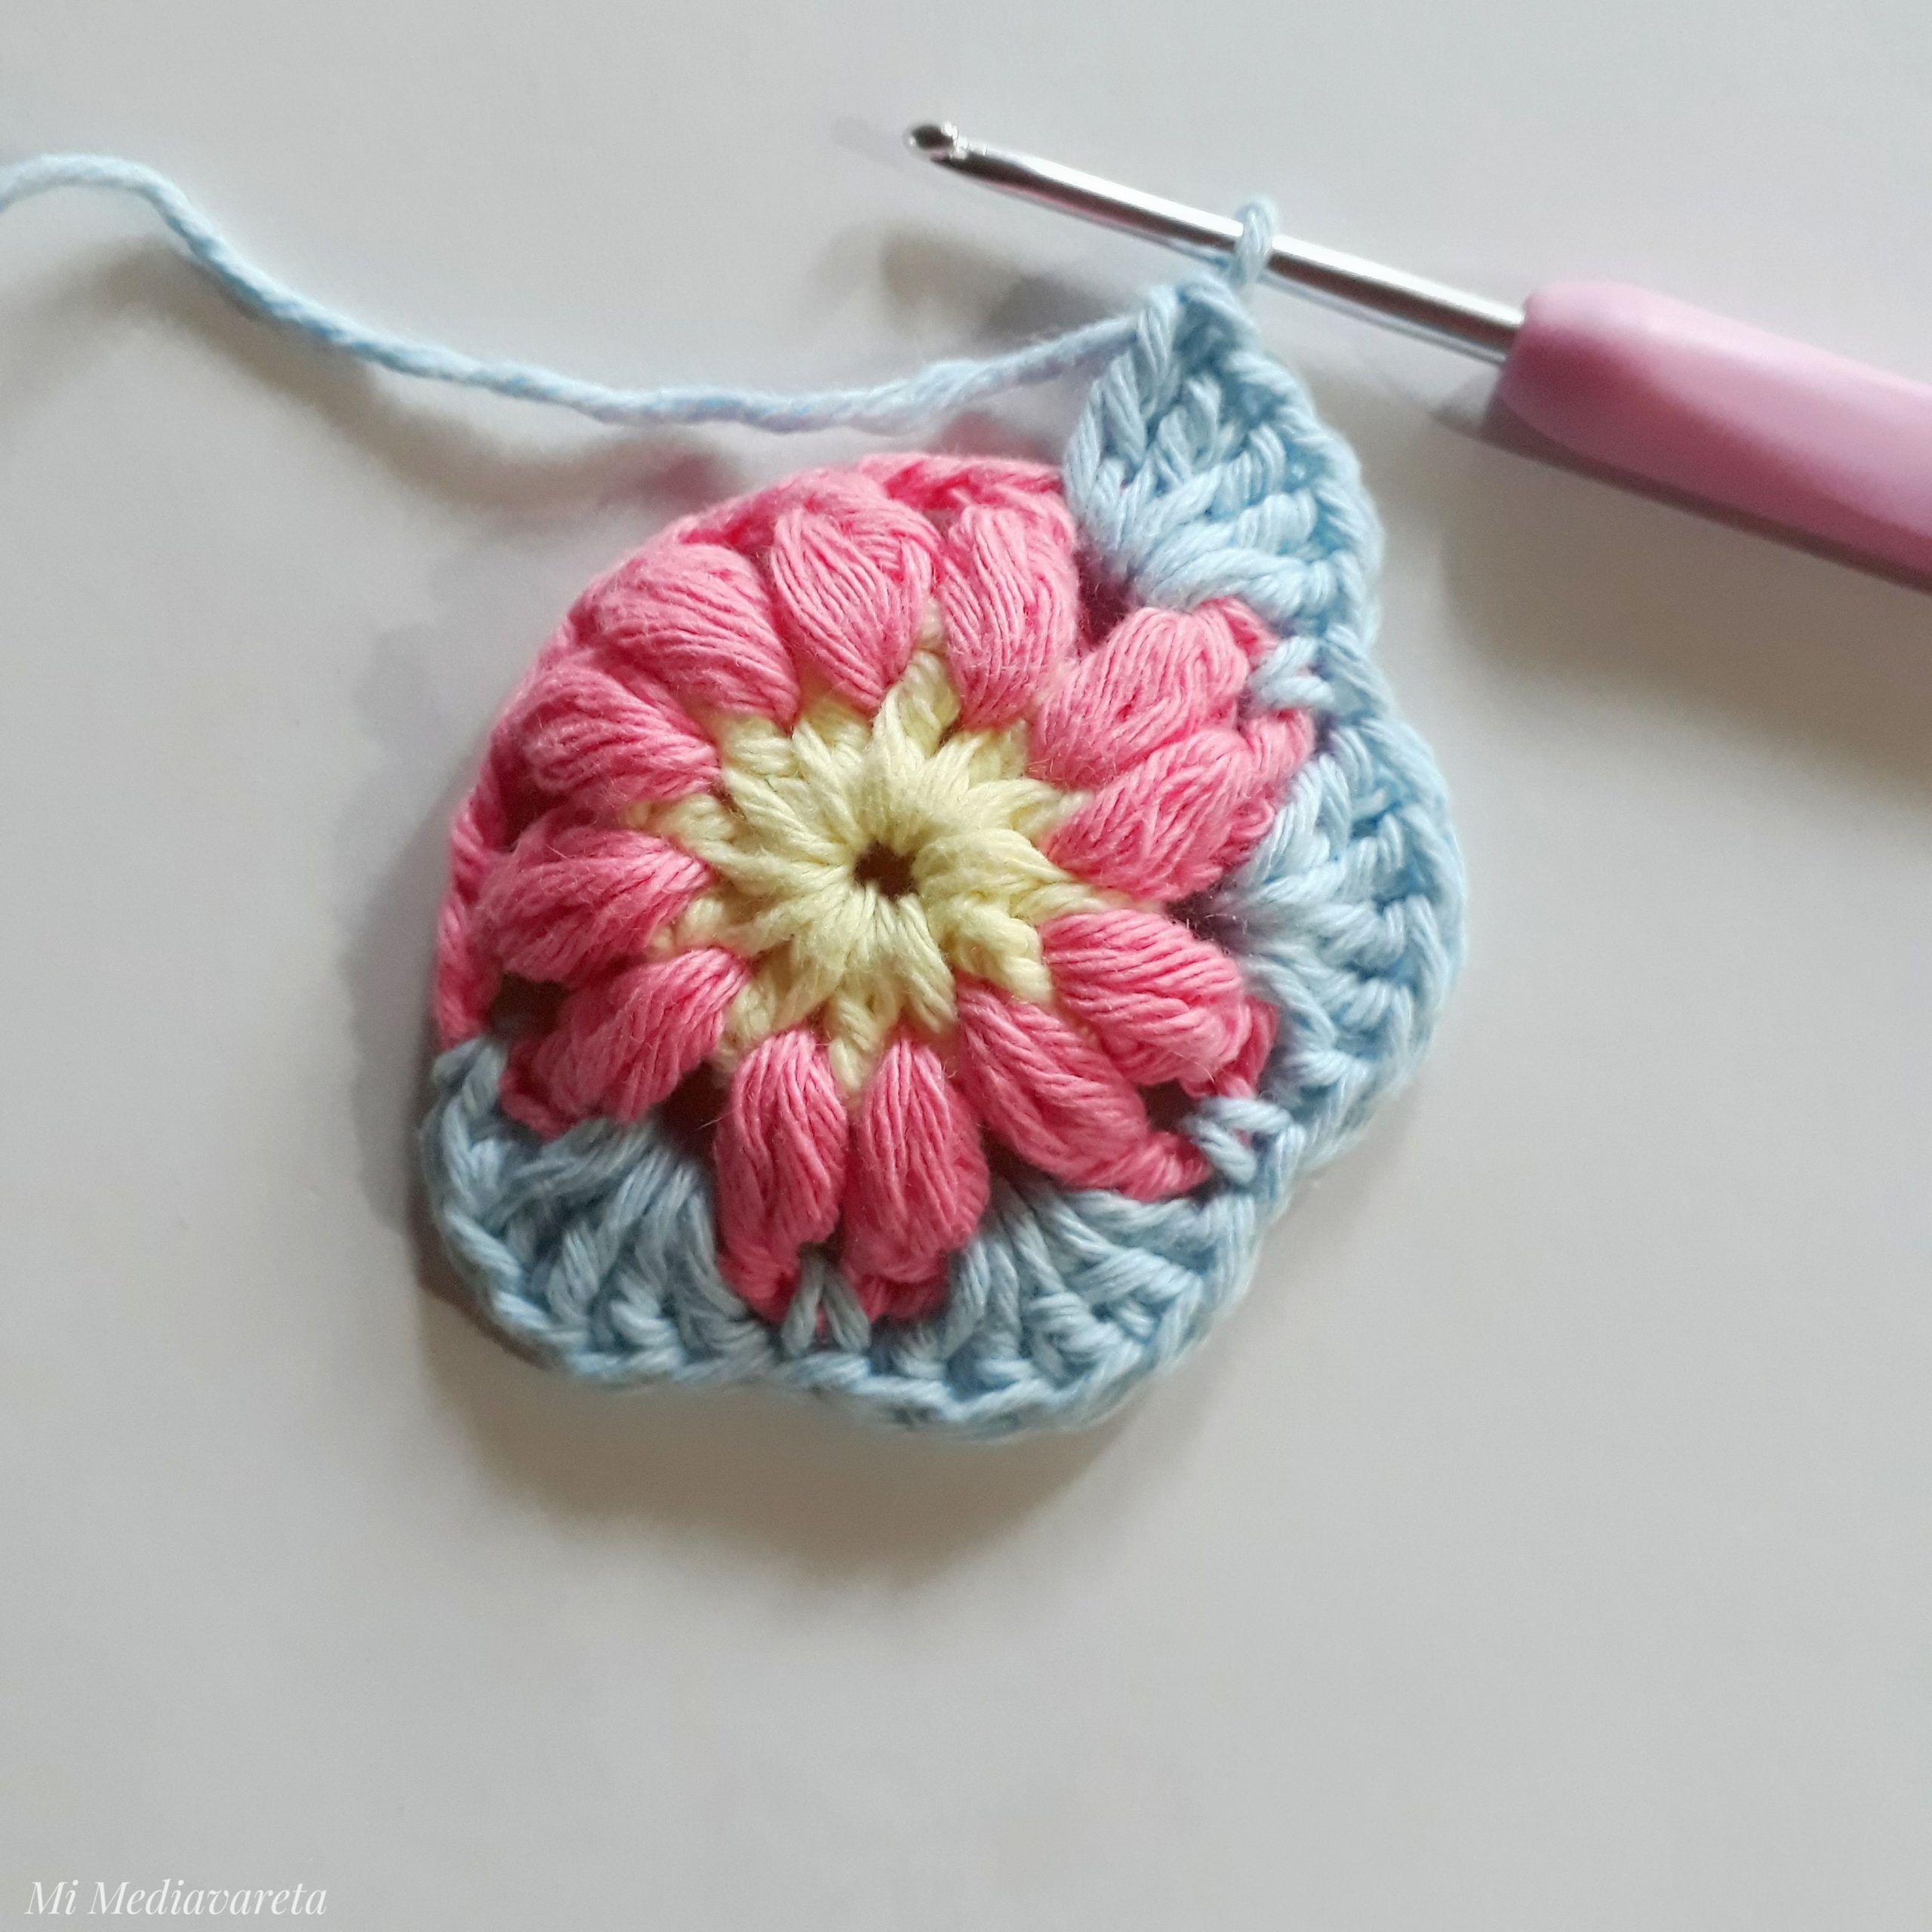 mini mandala a crochet con patrón